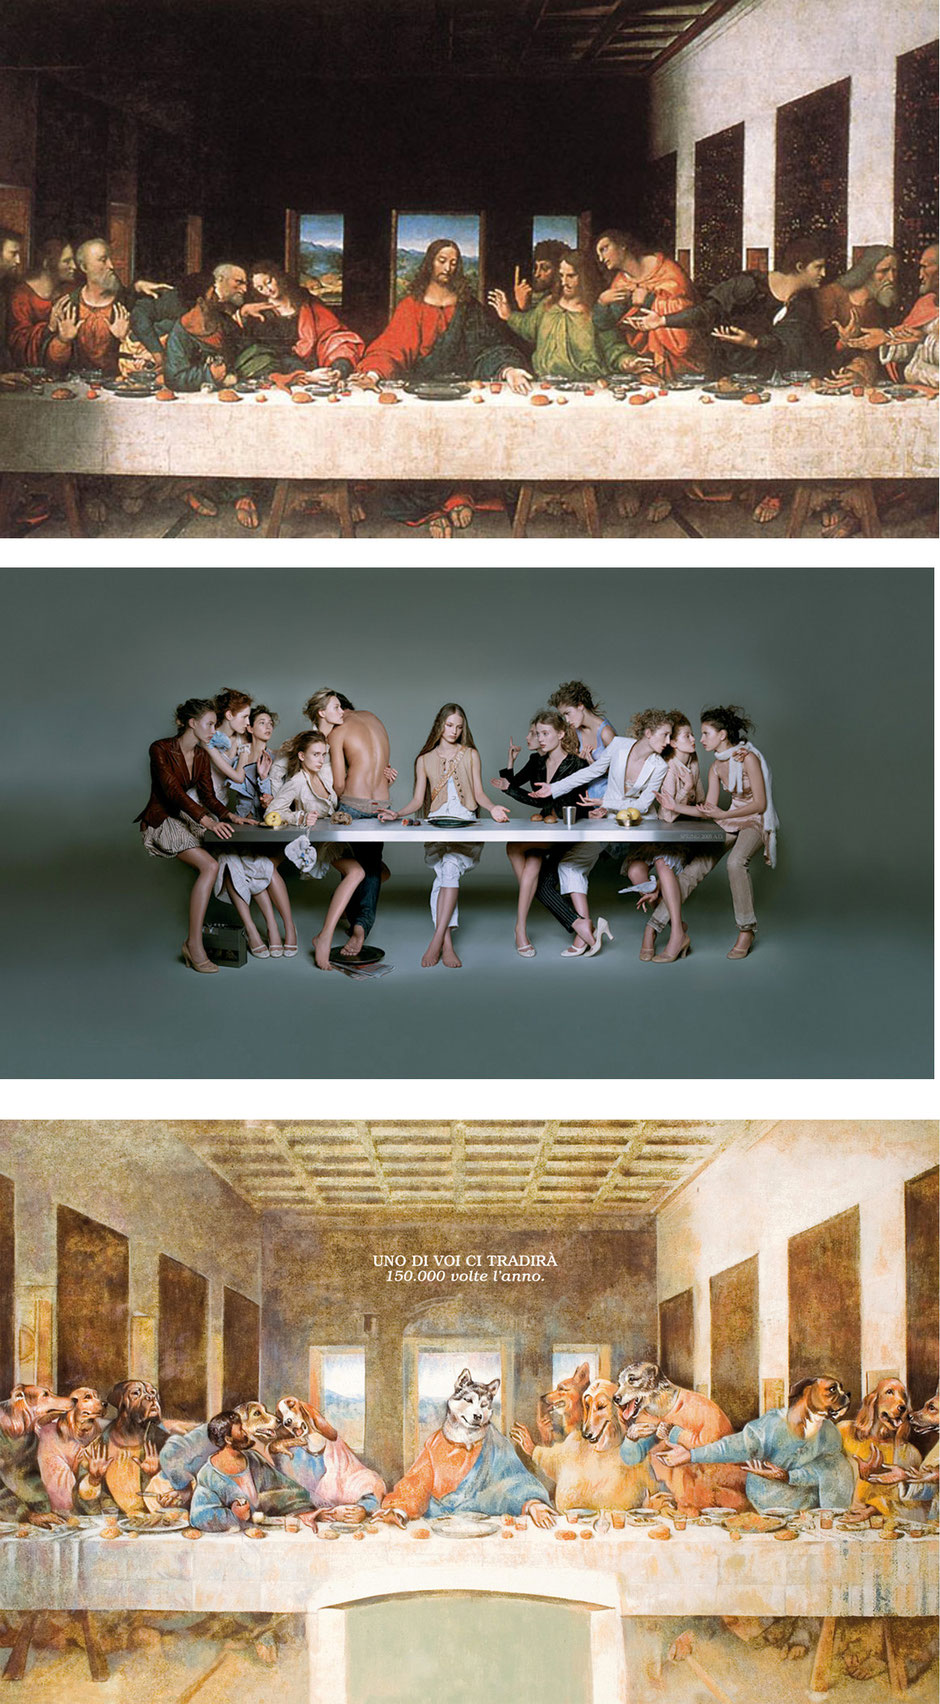 La última cena (Leonardo da Vinci)  - Marithe & Francois Girbaud - OIPA